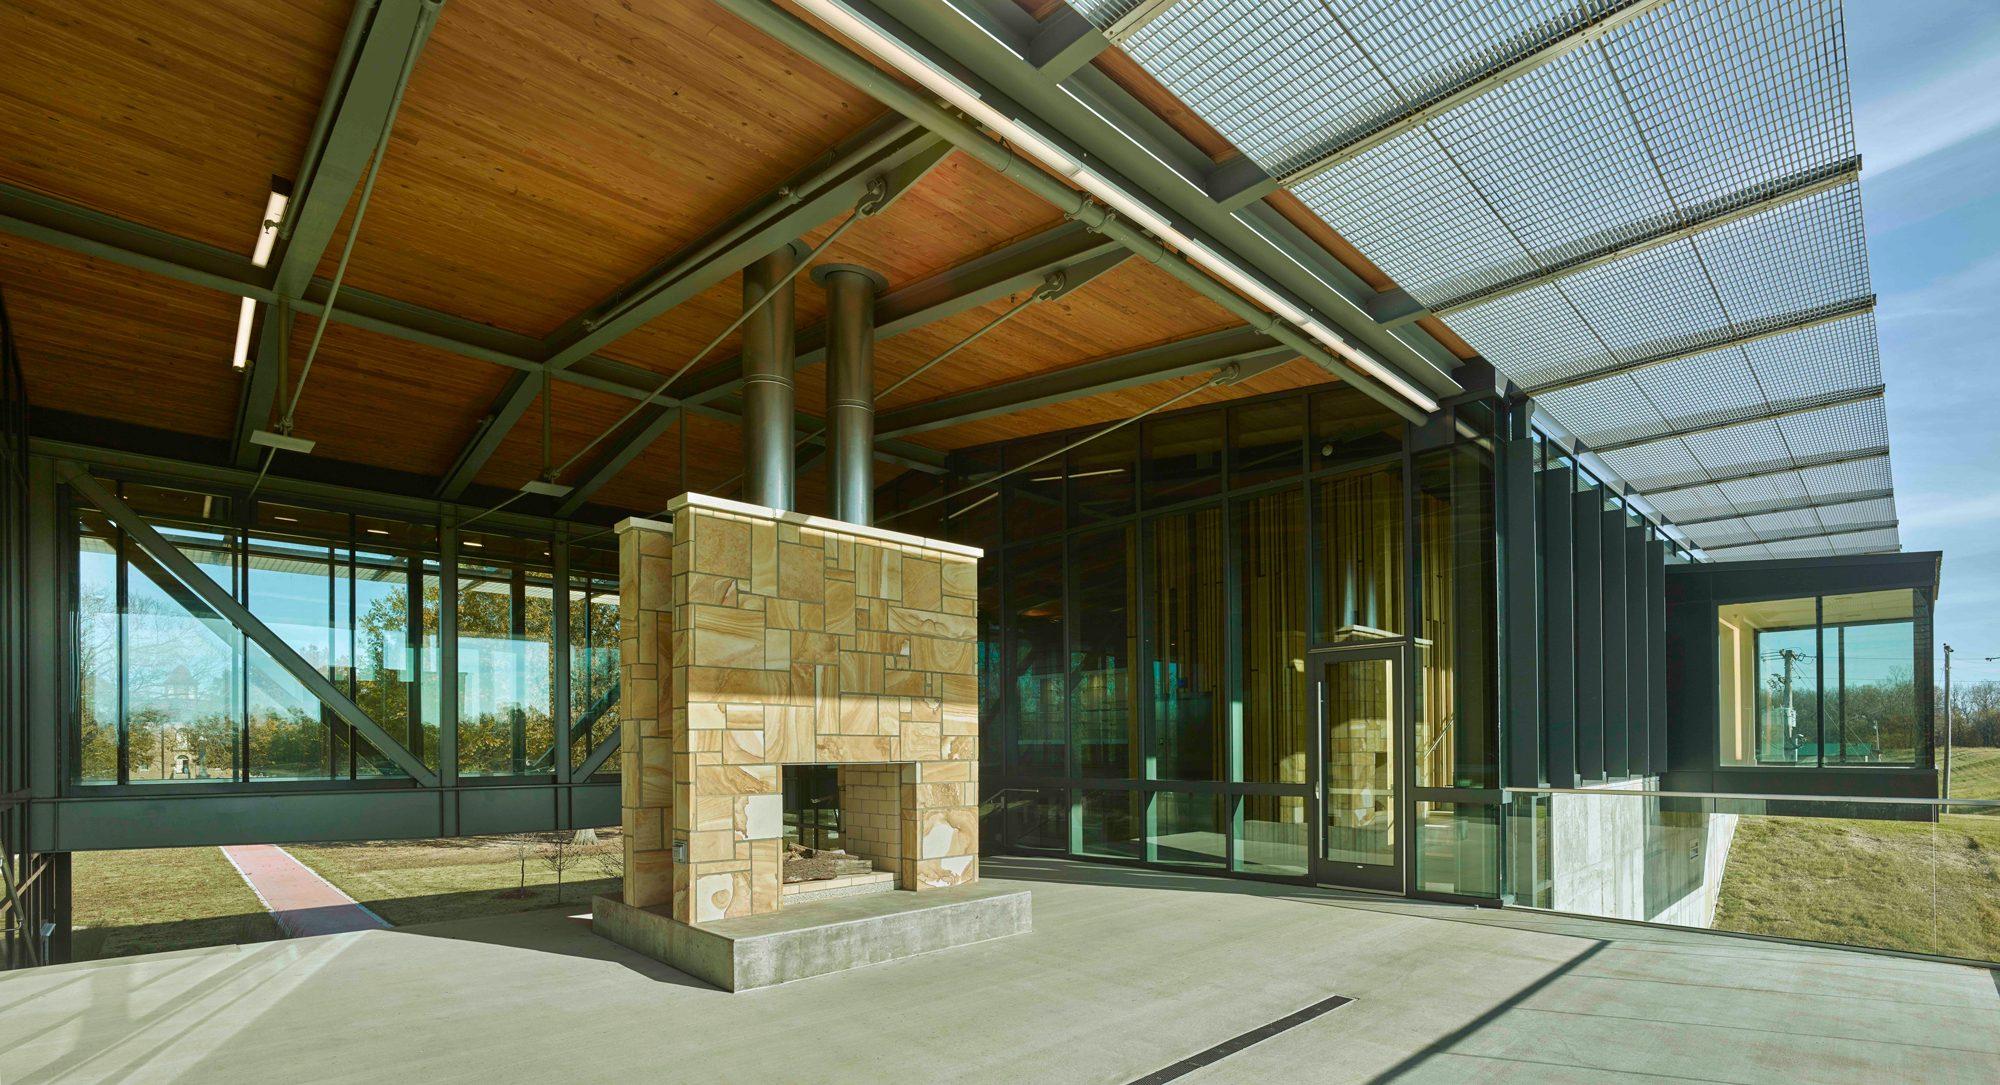 Jacksonport State Park Visitor Center